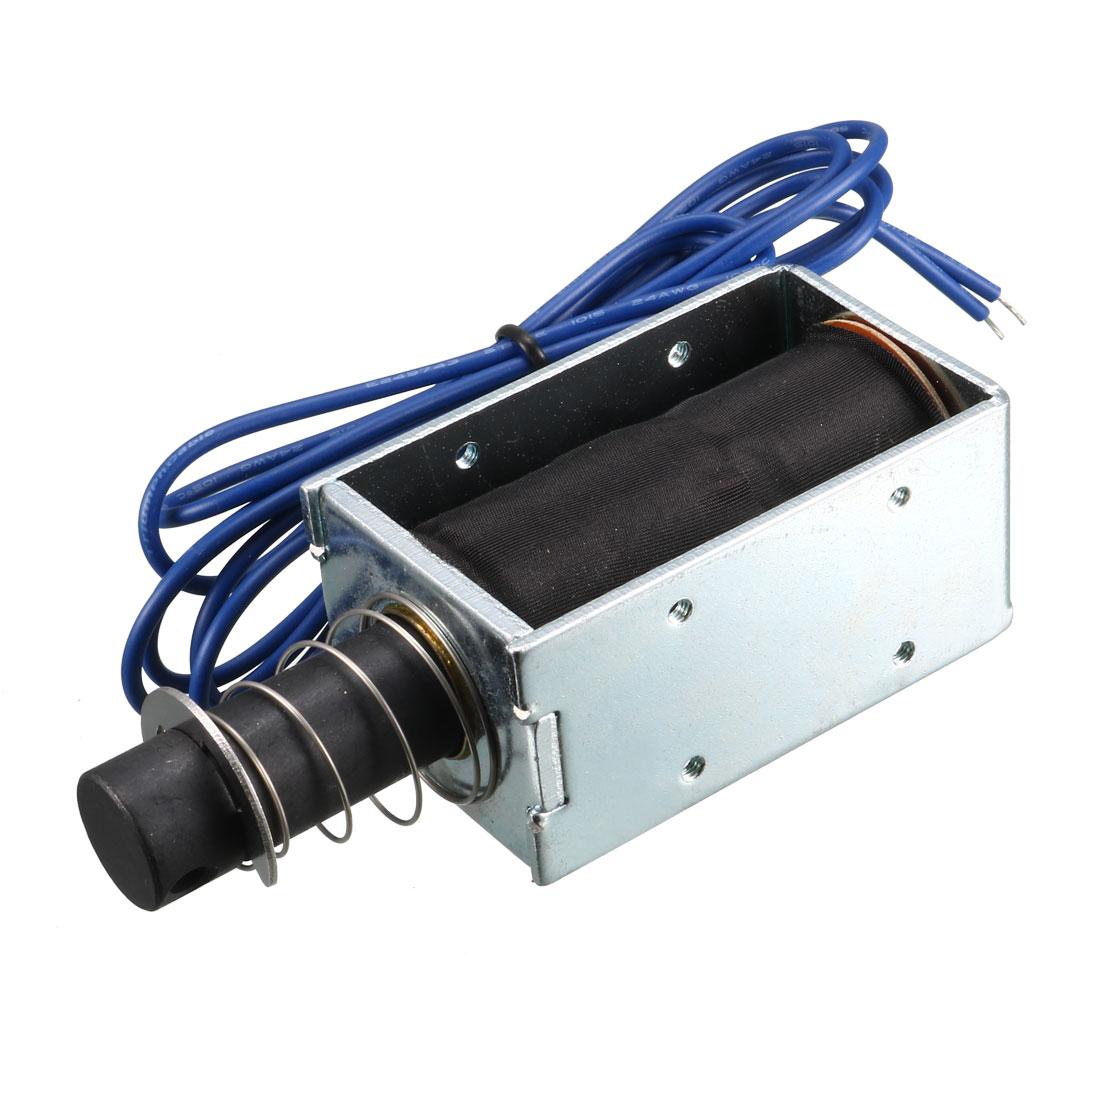 DC 12V 1.5A 500g/15mm Pull Push Type Open Frame Solenoid Electromagnet